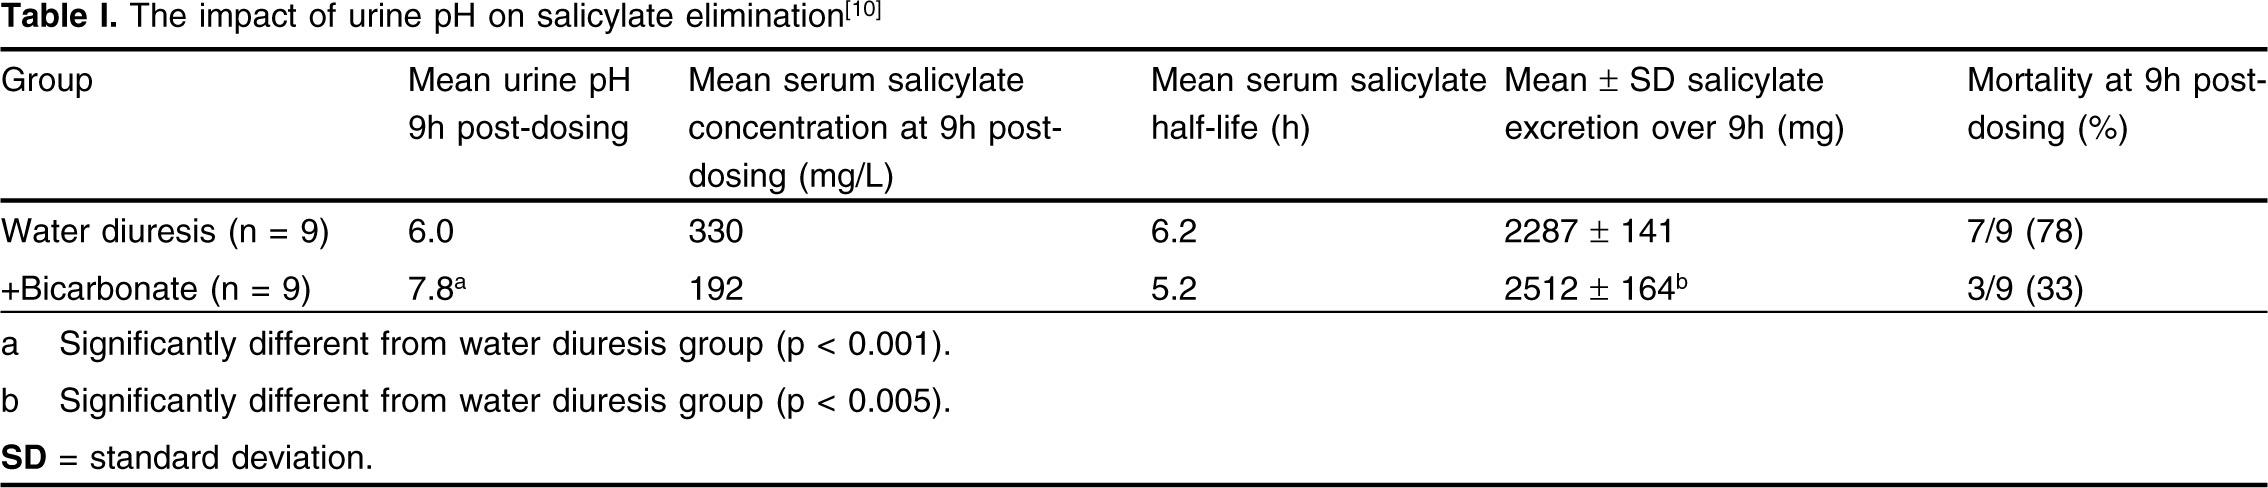 Does Urine Alkalinization Increase Salicylate Elimination